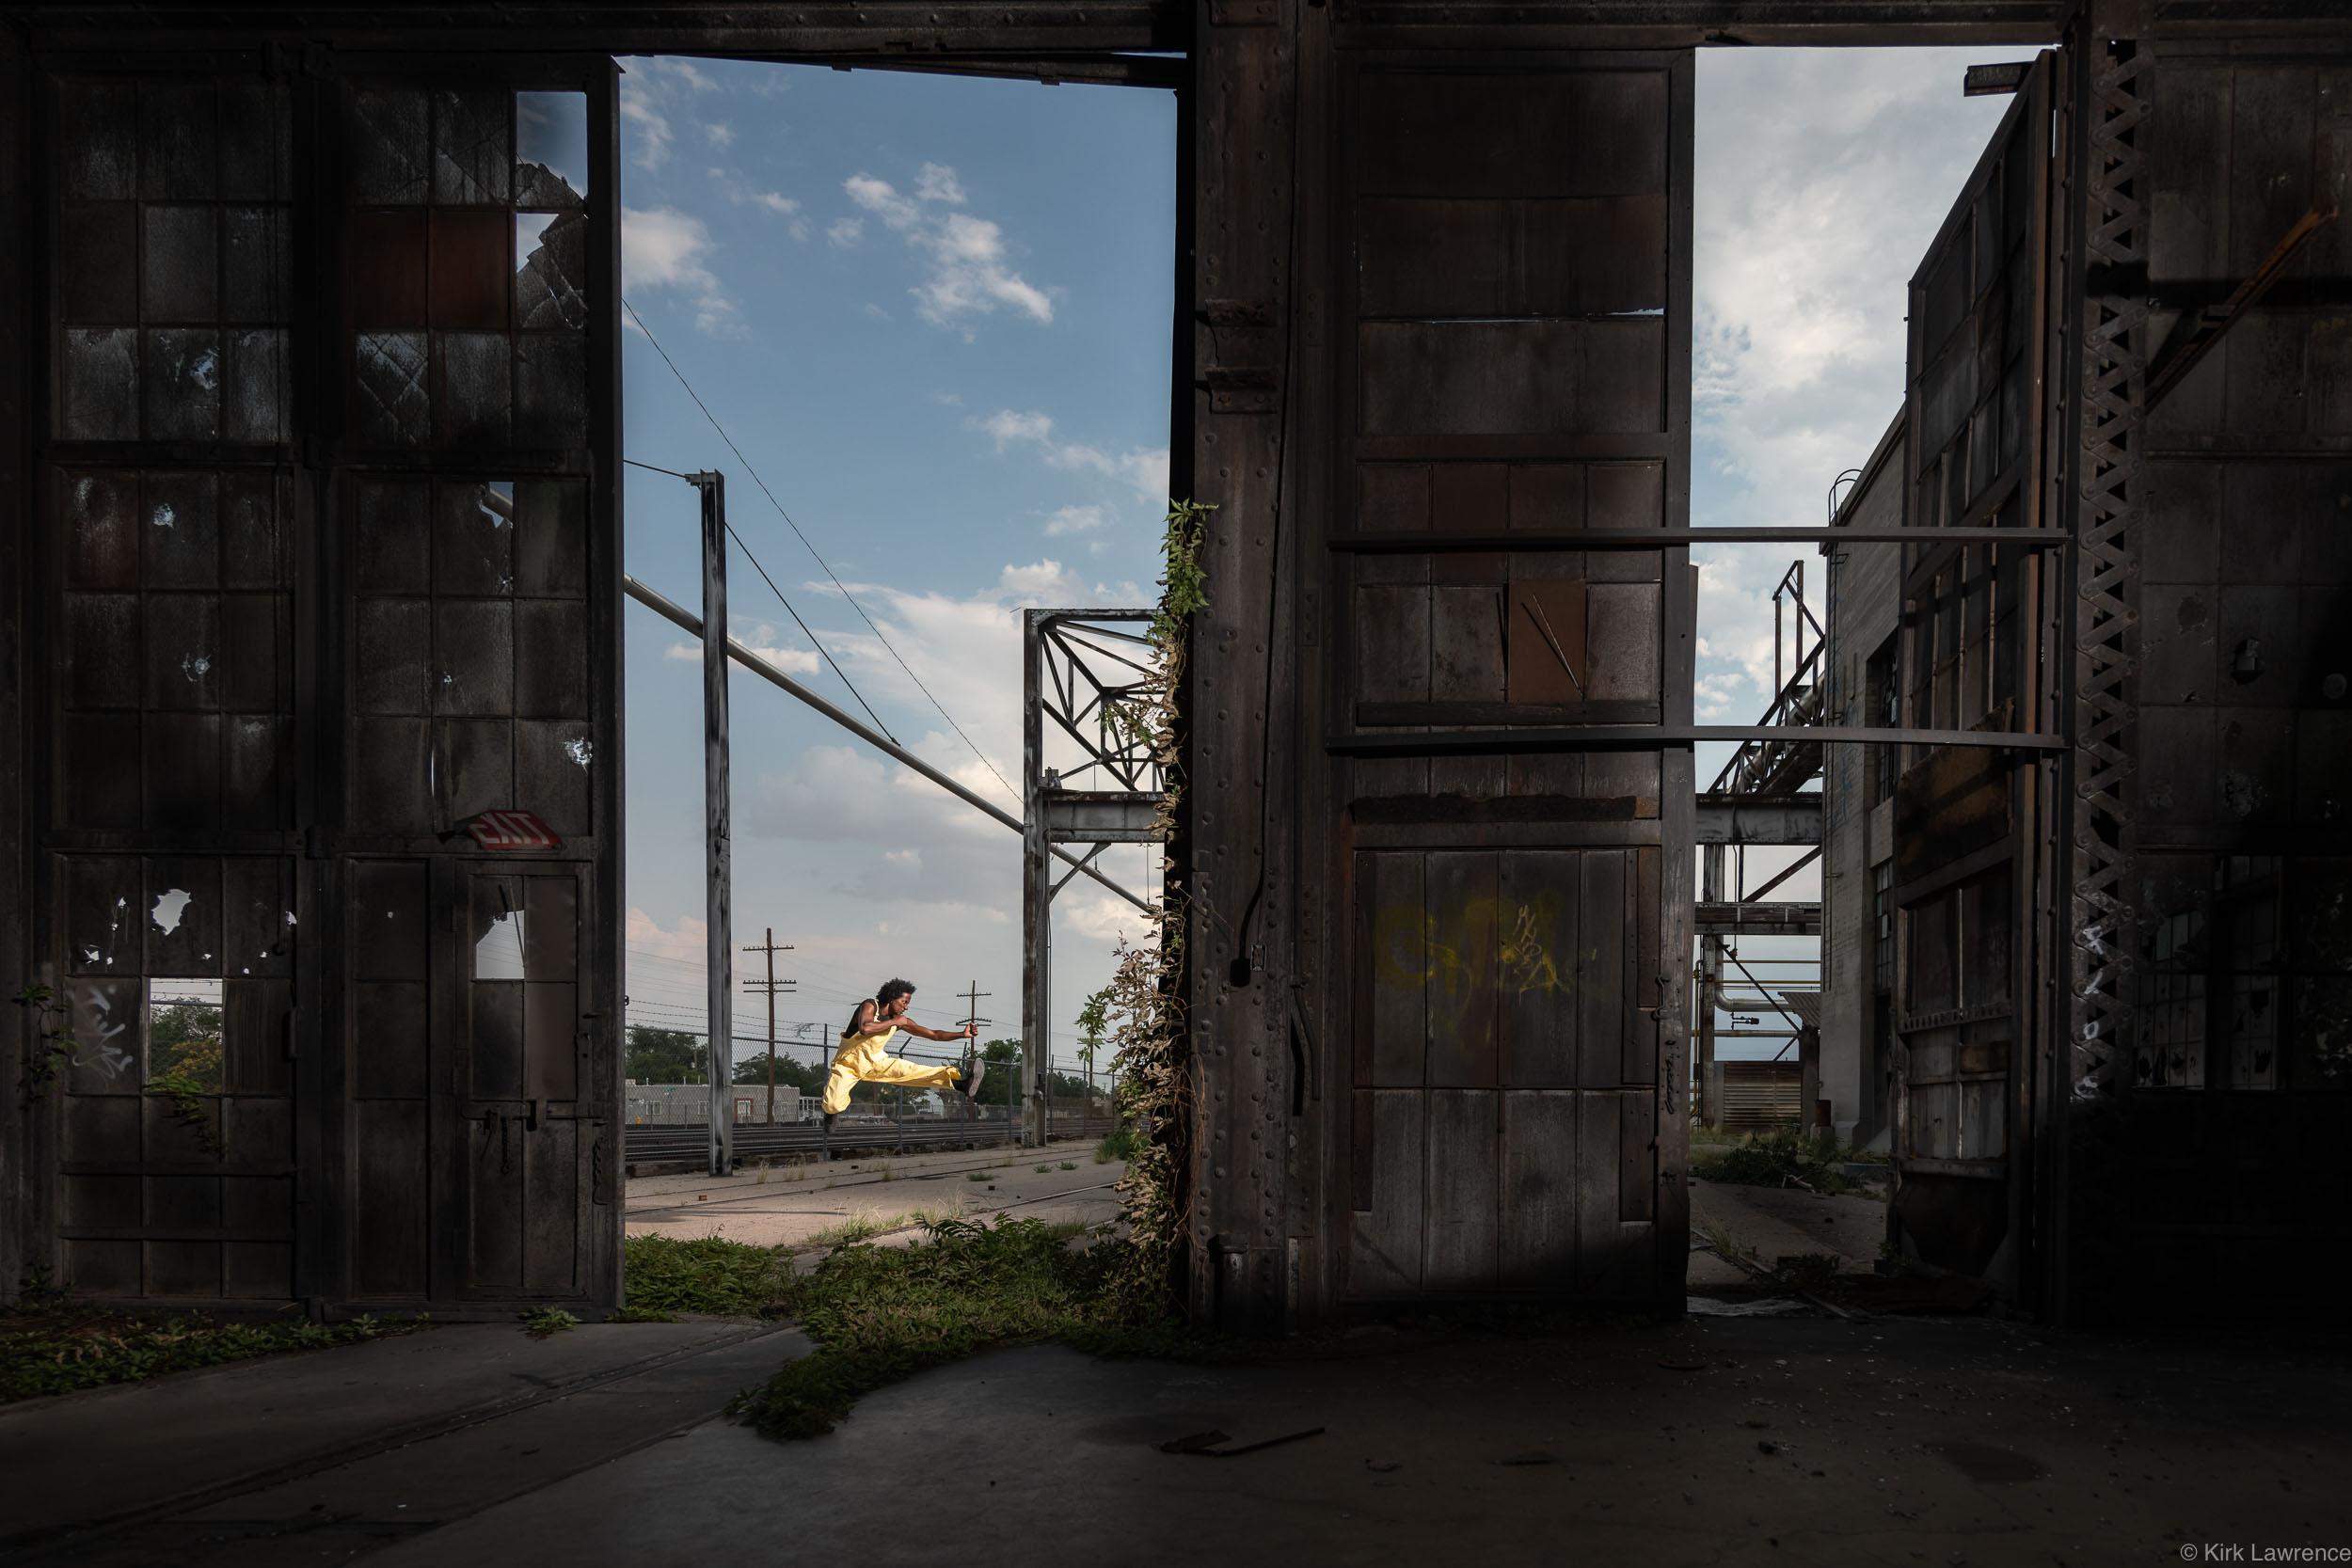 capoeira_dancer_Albuquerque_train_yard.jpg